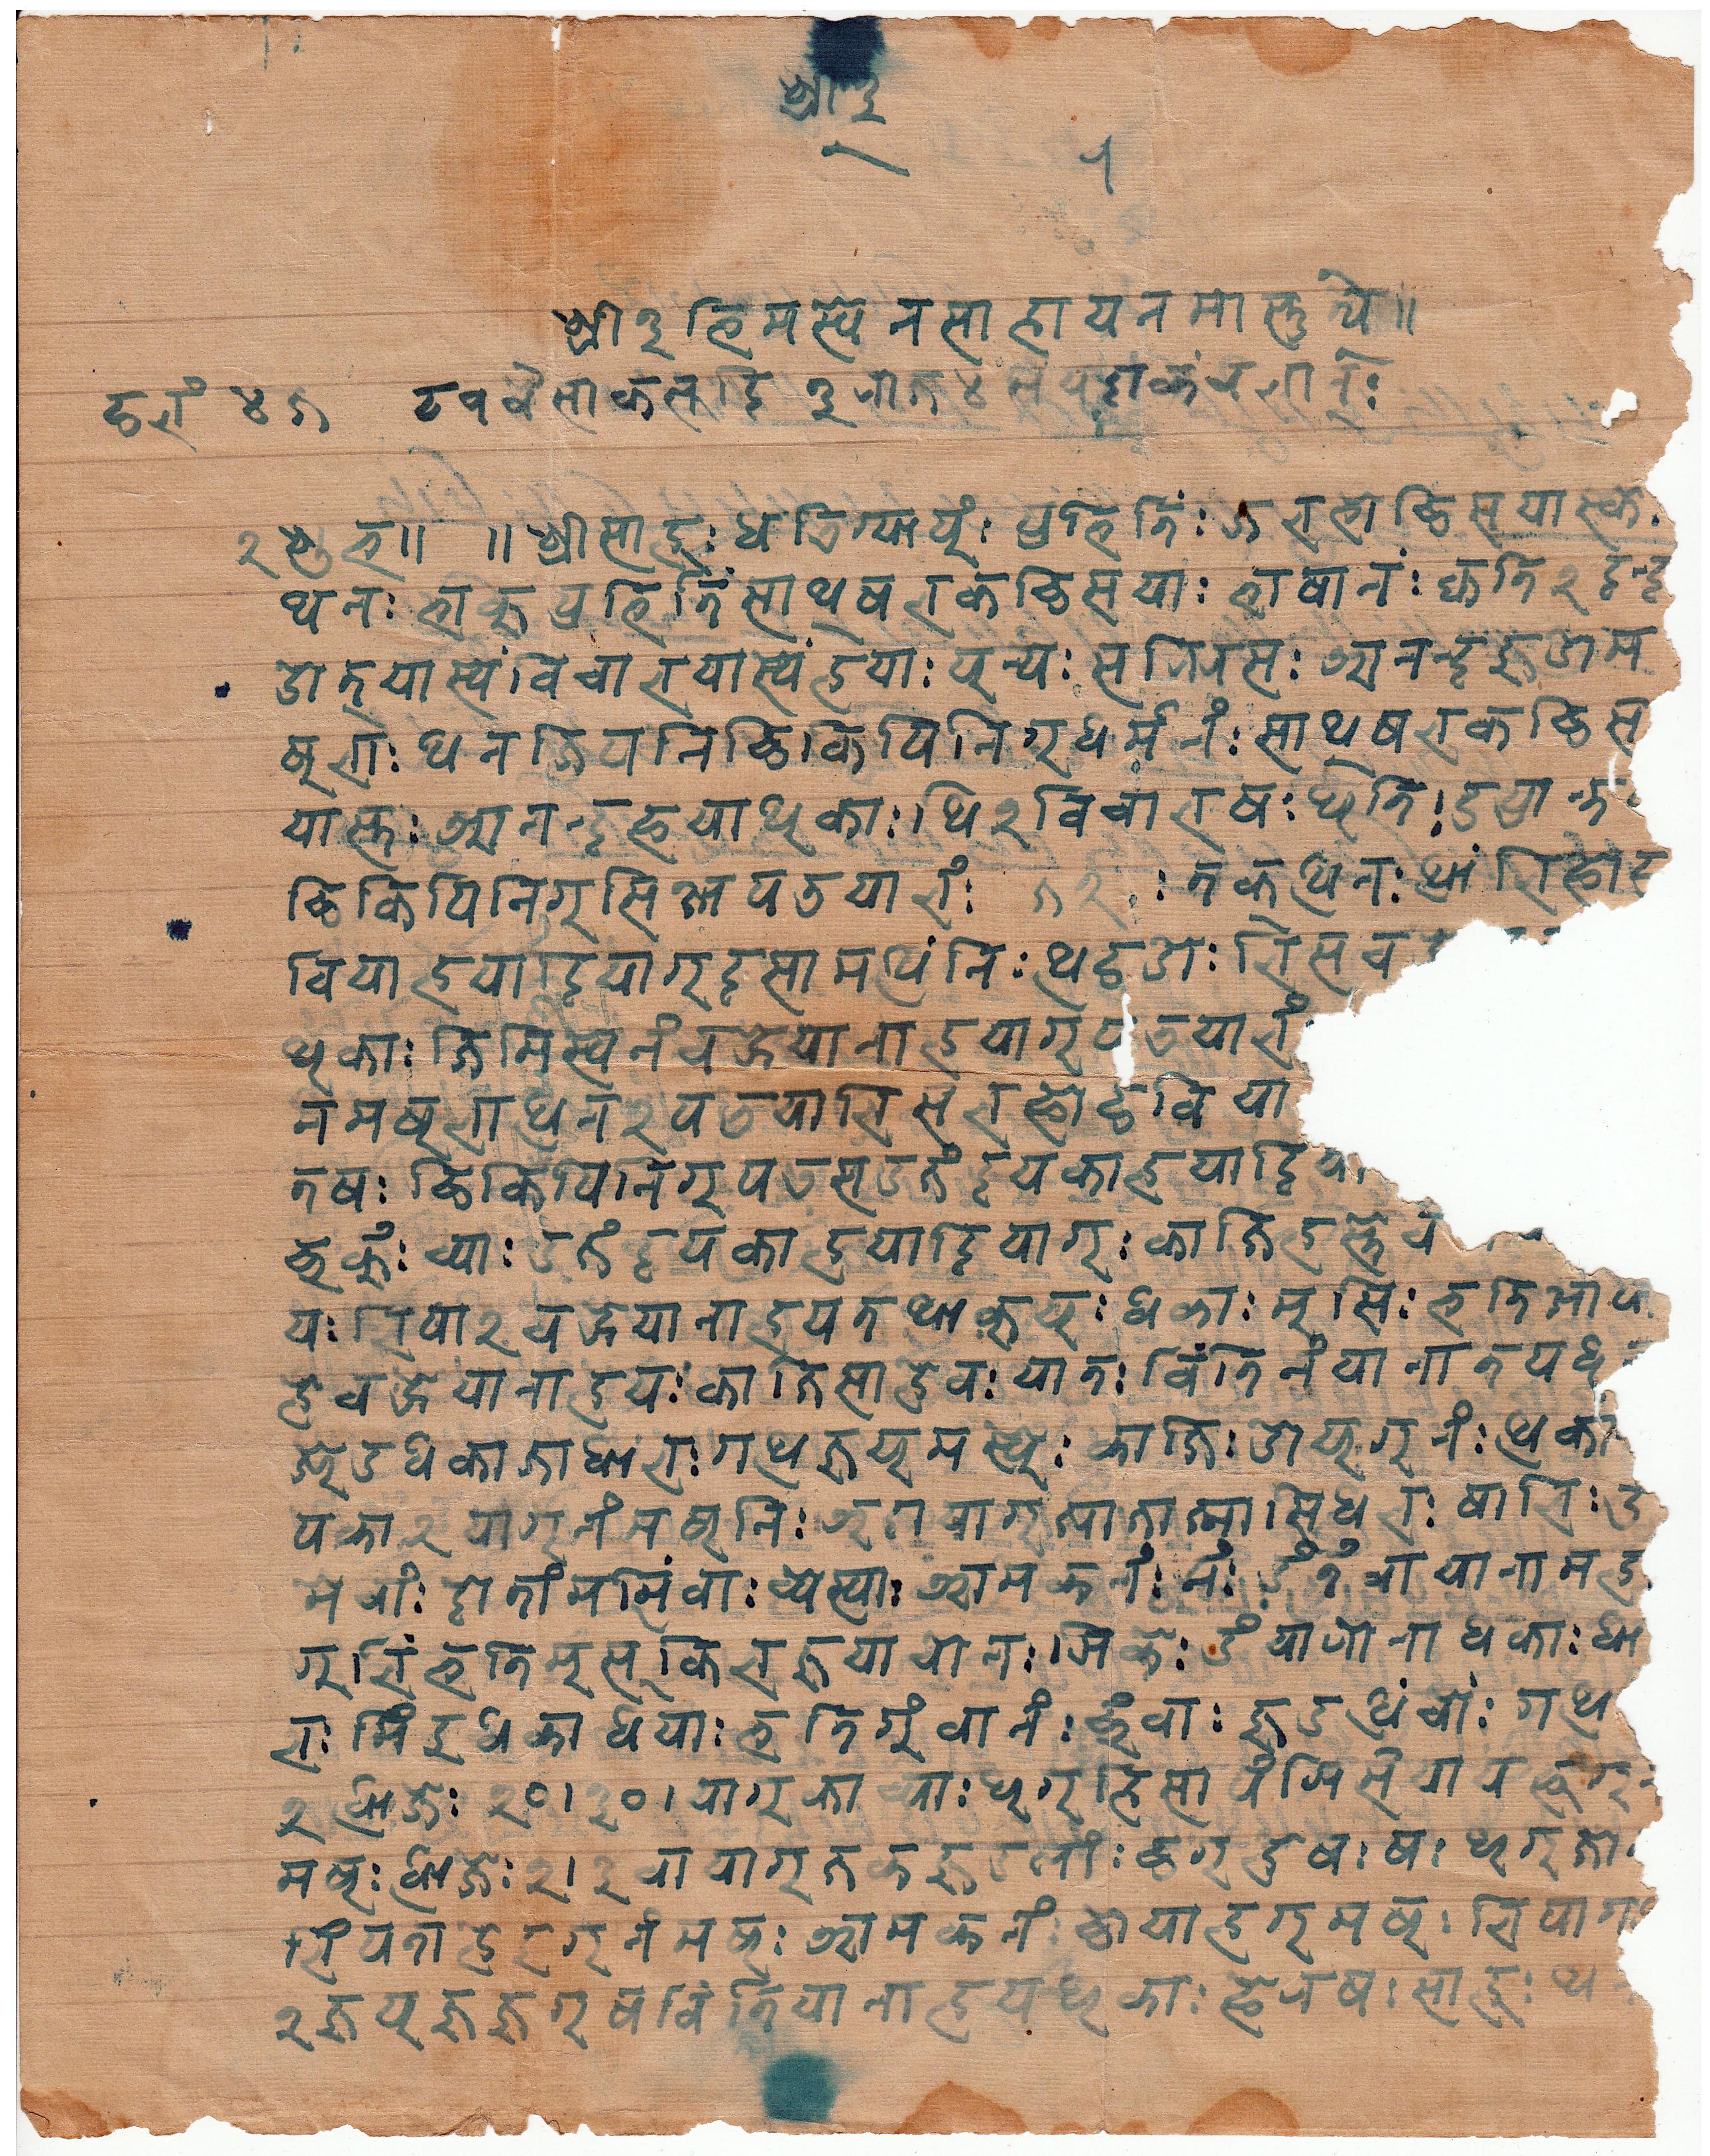 history of nepal pdf download